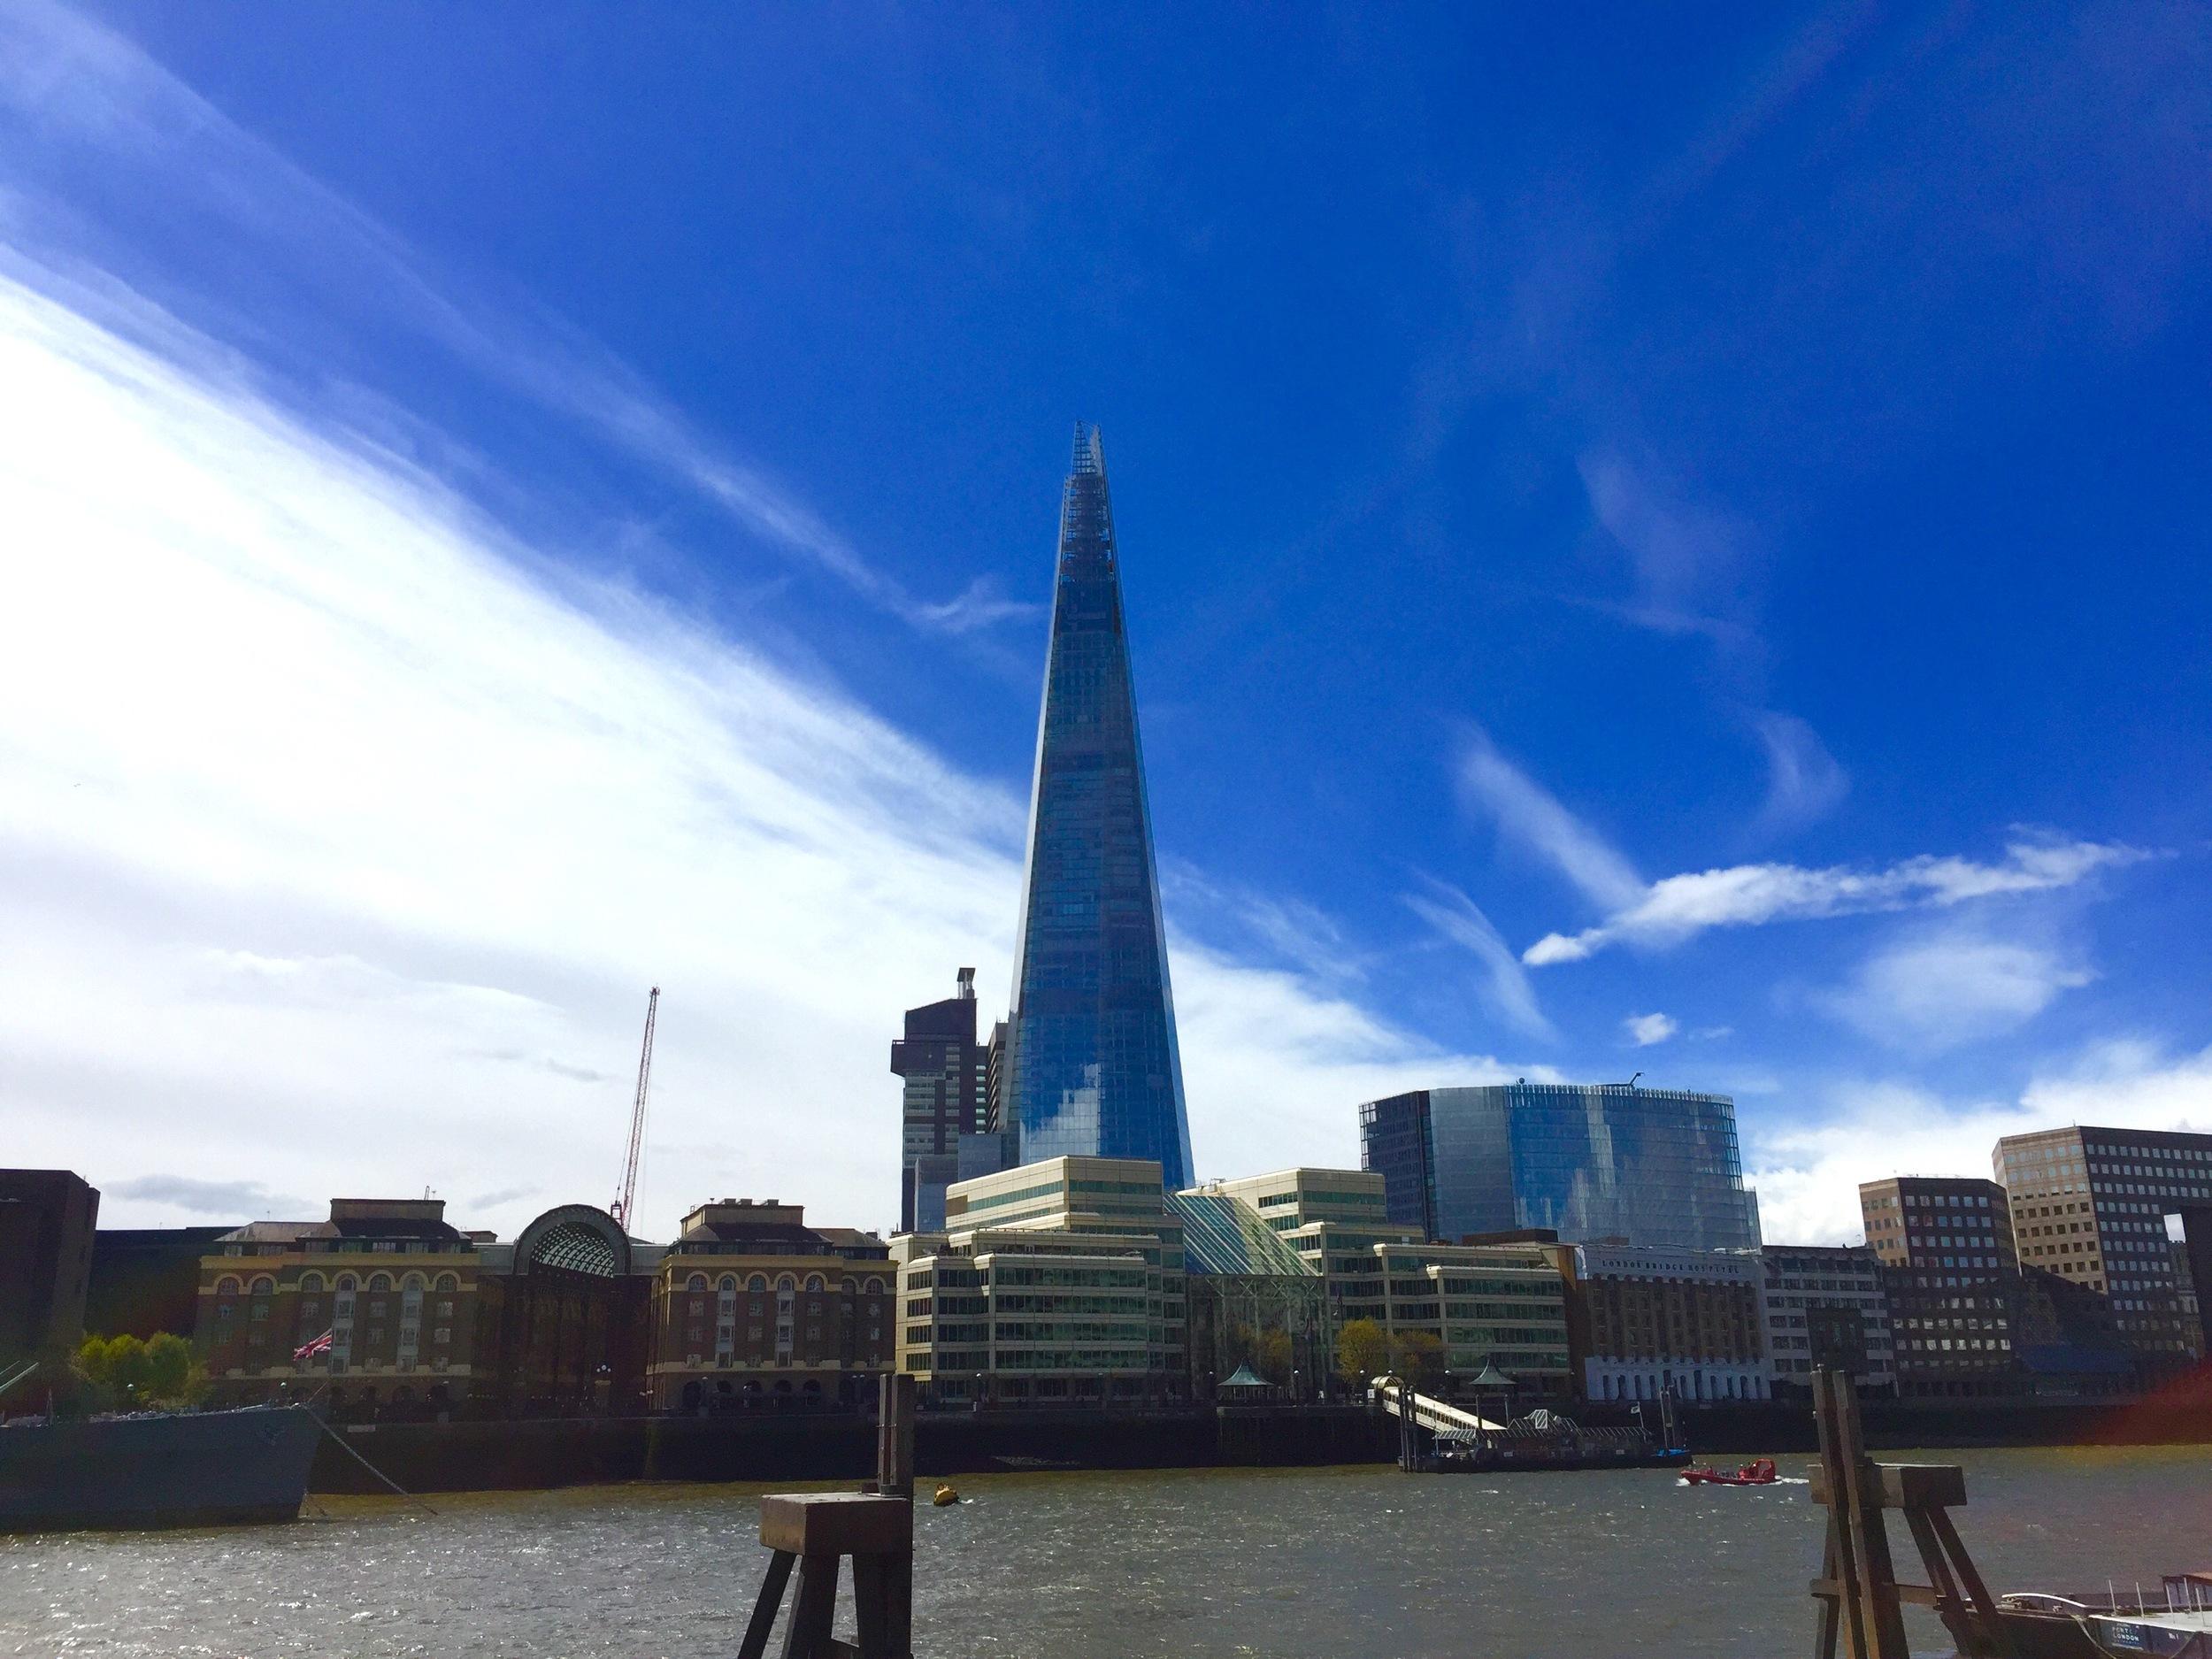 The Shard in London.